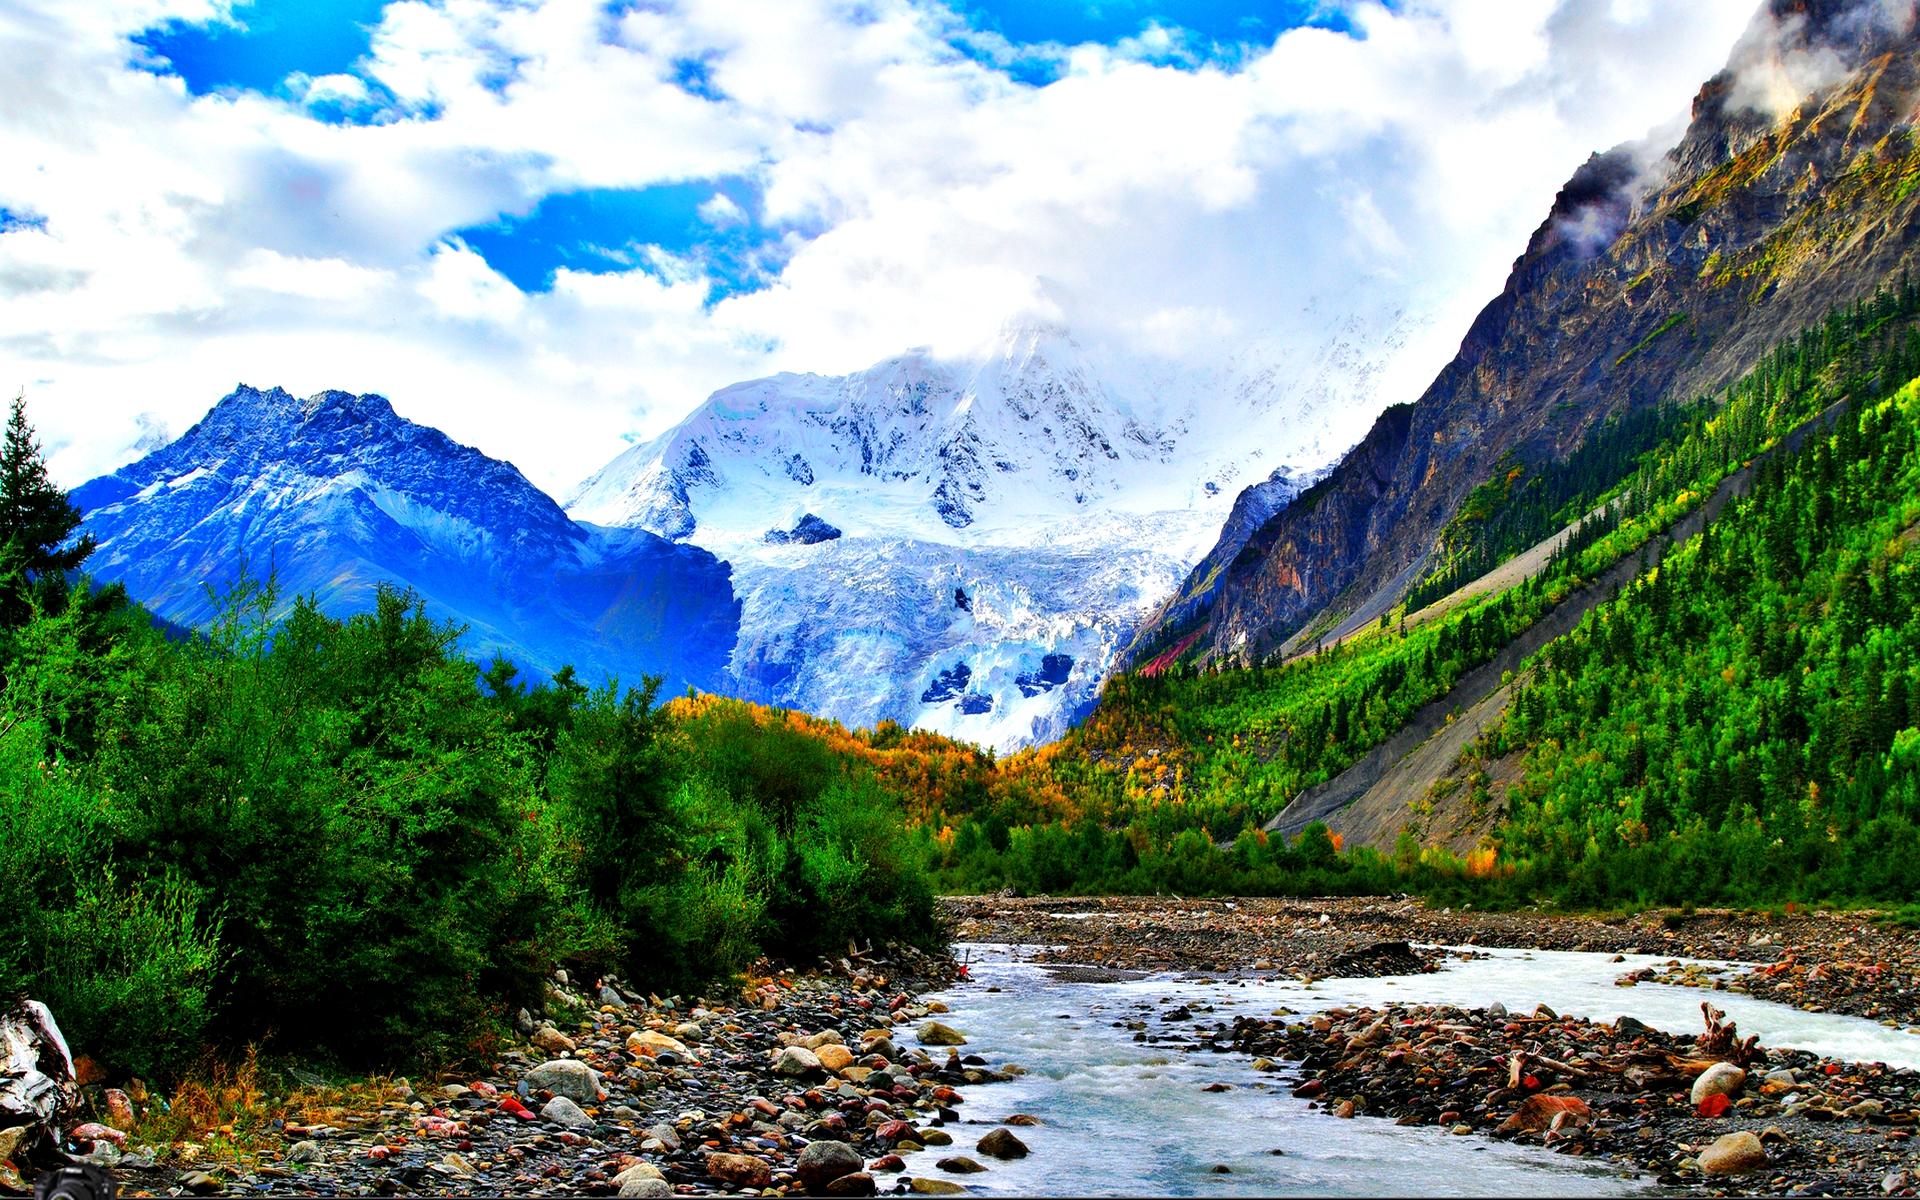 Stunning Mountain Wallpaper 45505 1920x1080 px